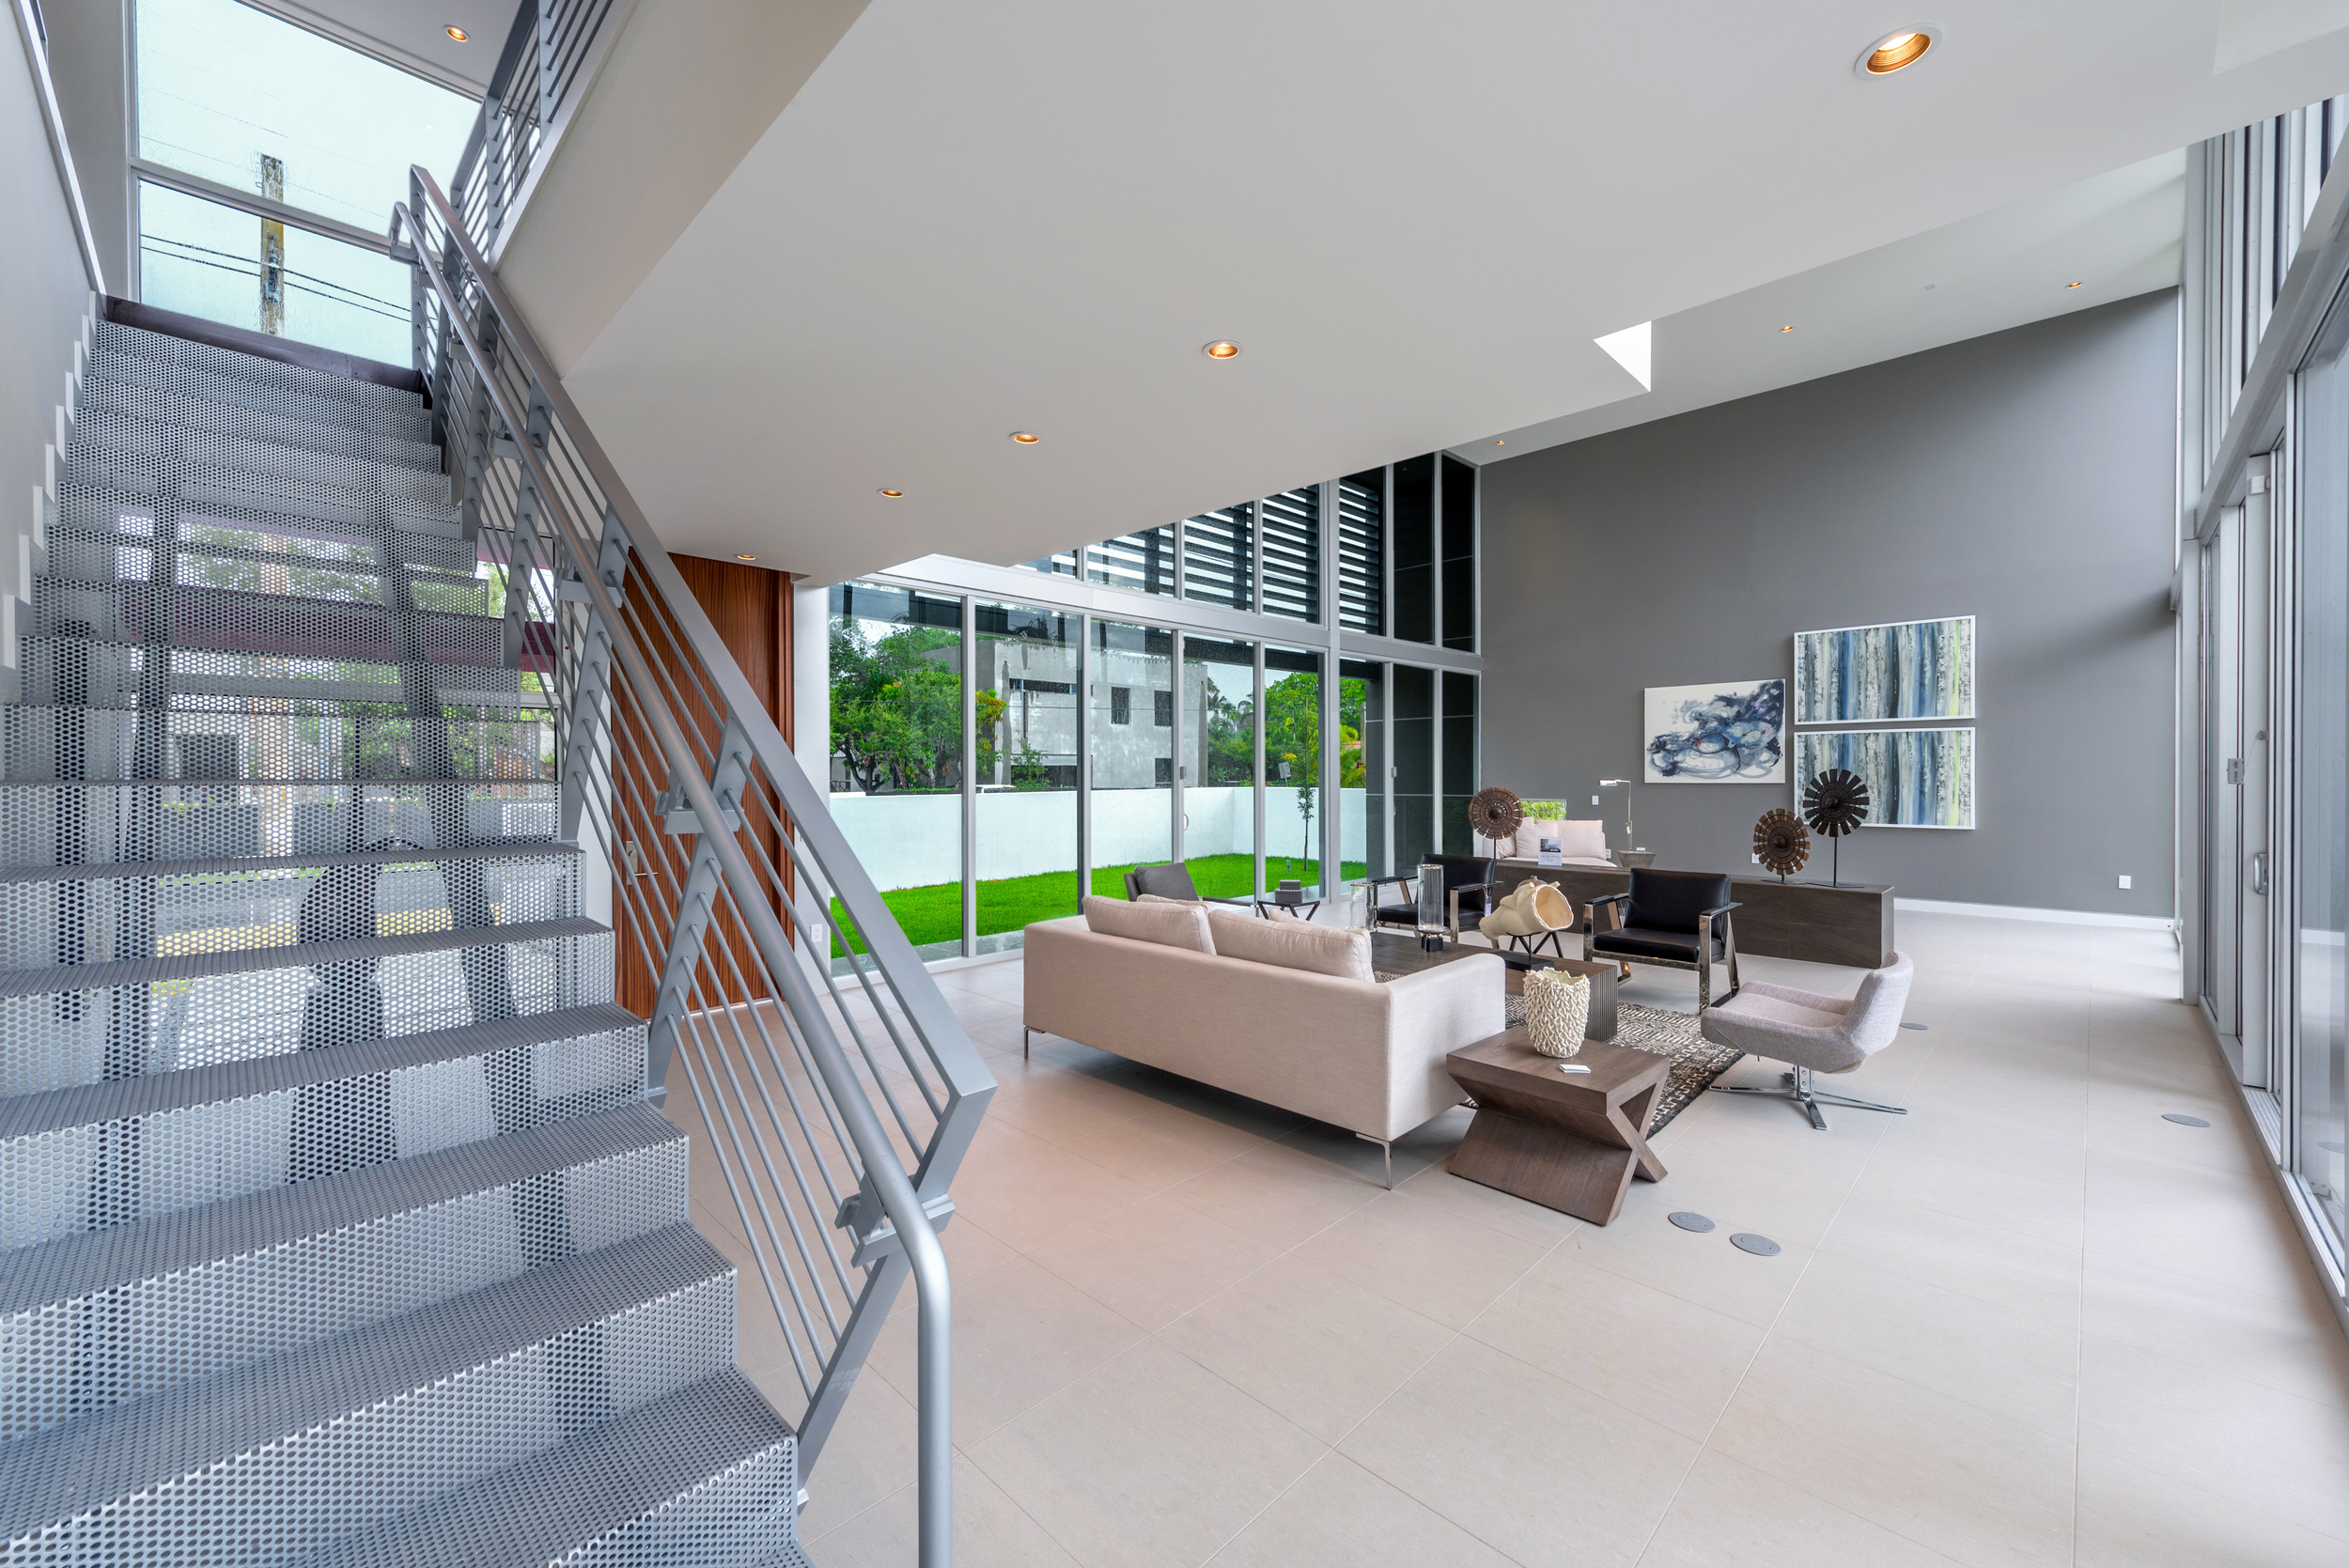 The Setting Homes Plum House Miami Florida Interior Living Room TARIS Real Estate